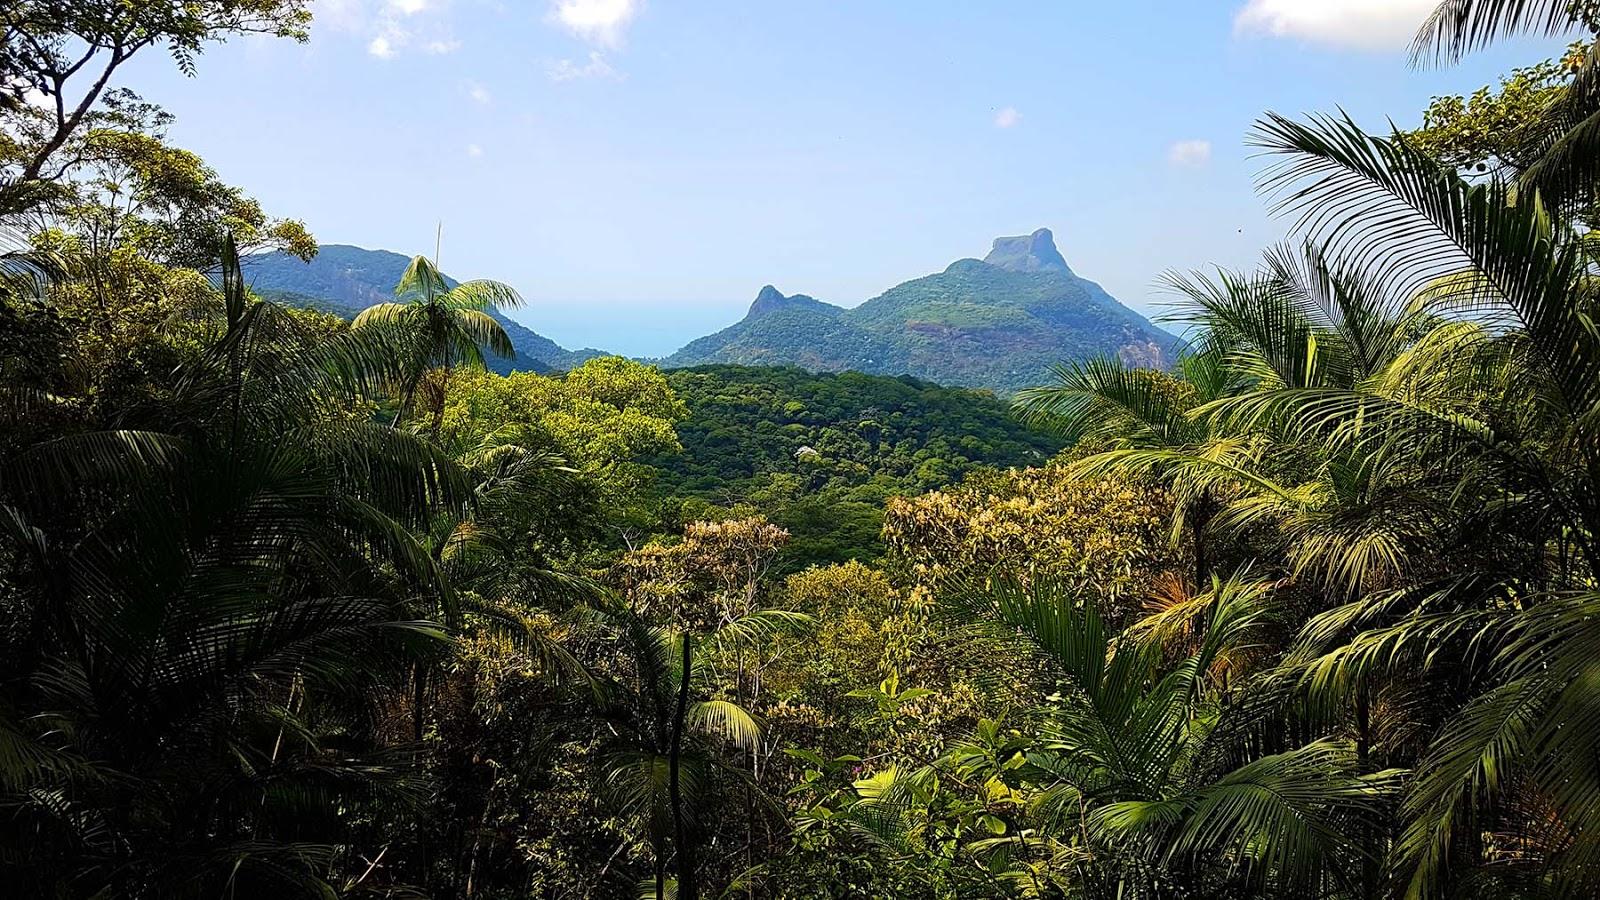 Vista do Almirante na Floresta da Tijuca.